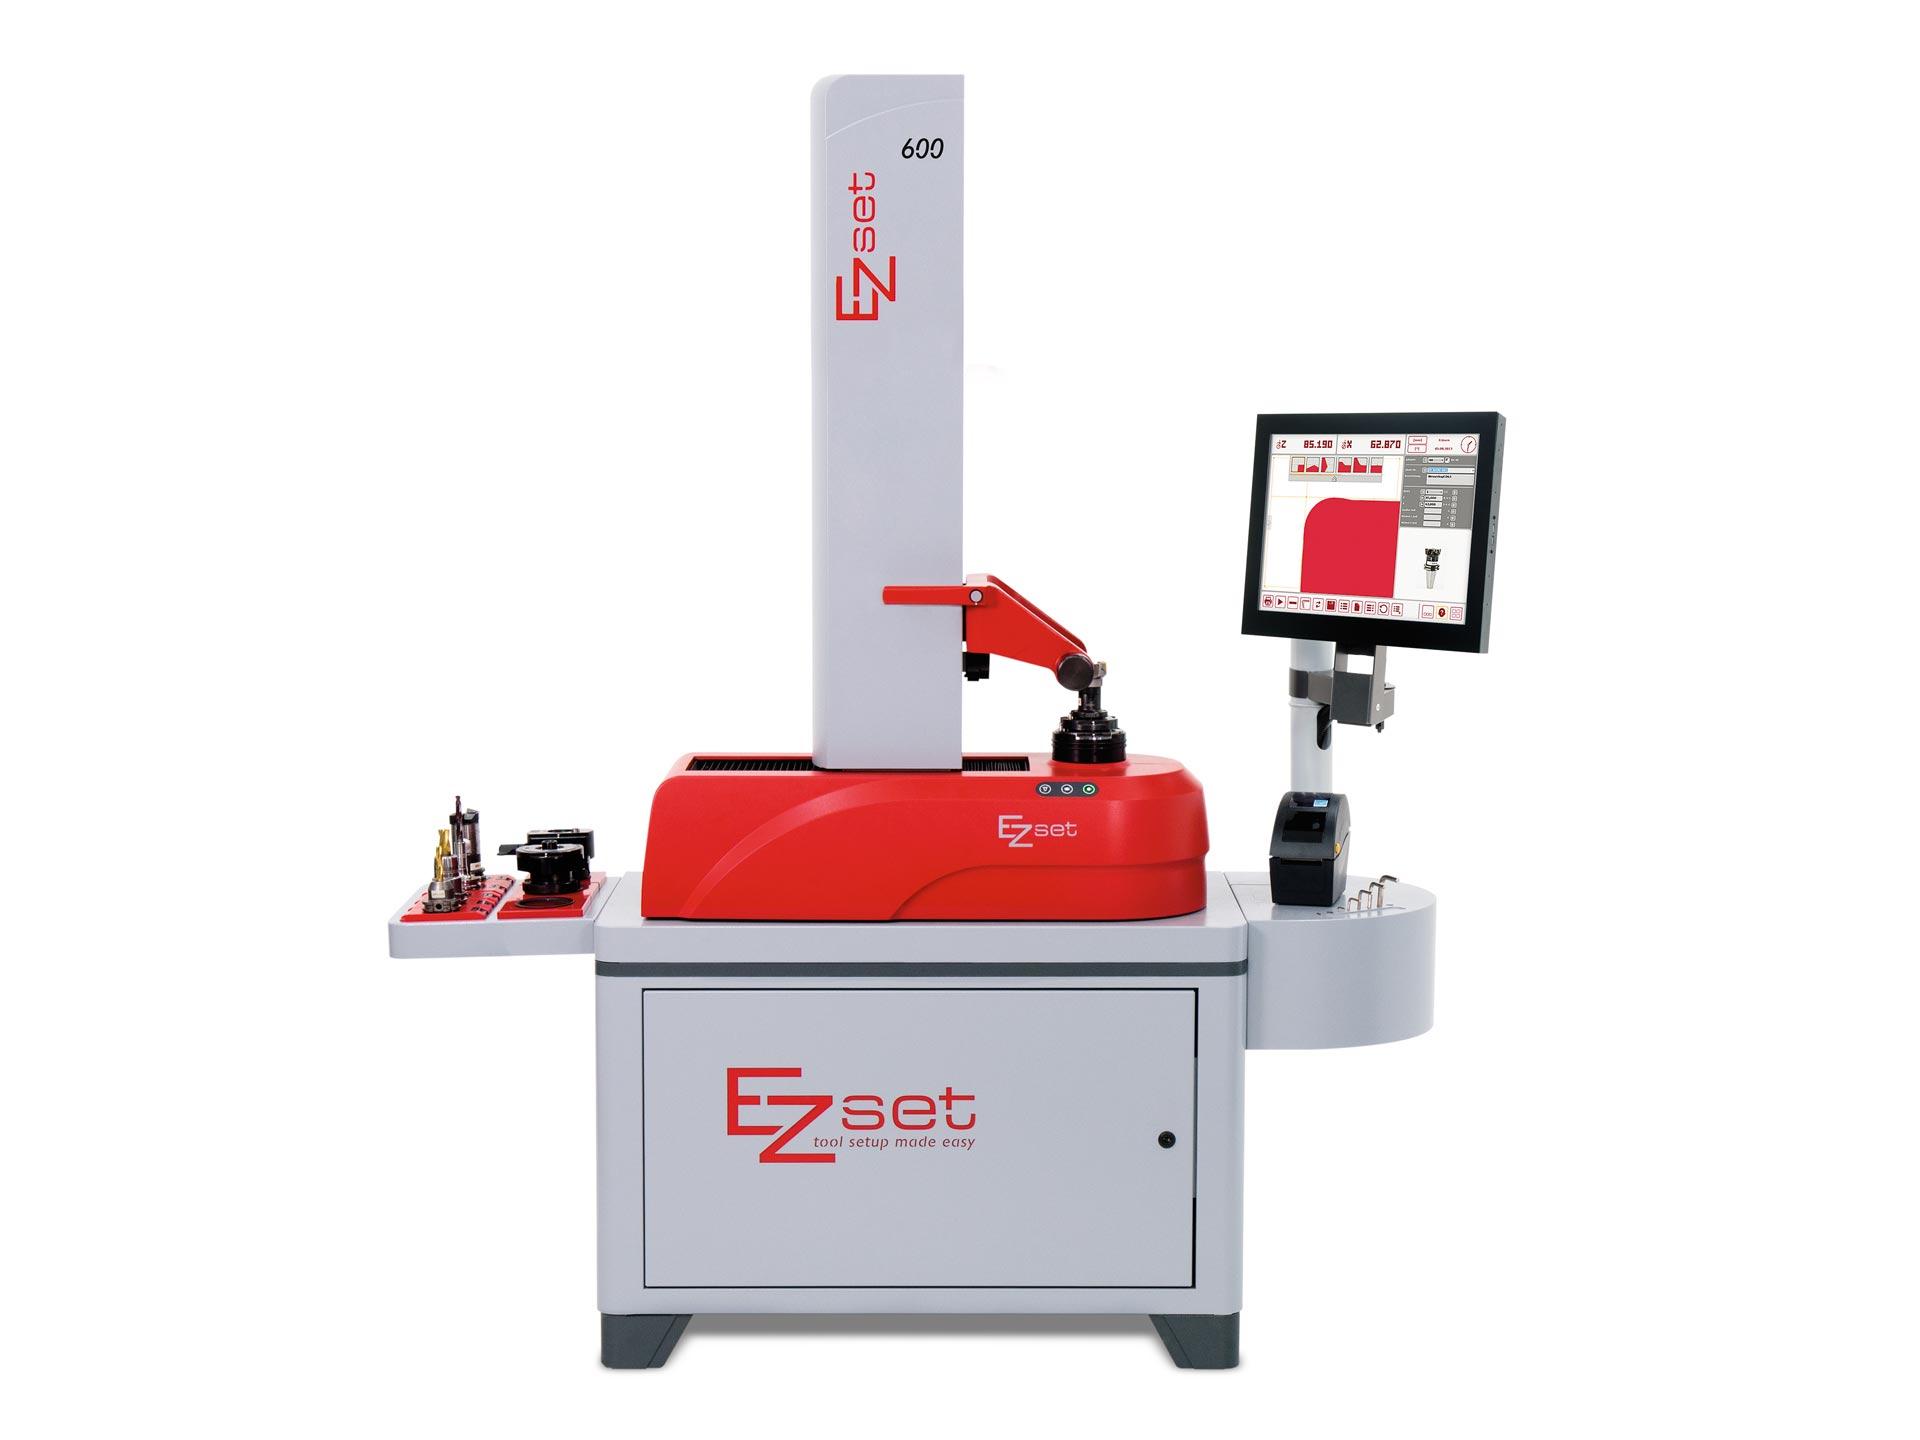 Spinner AG - EZset 600 mit ImageController3